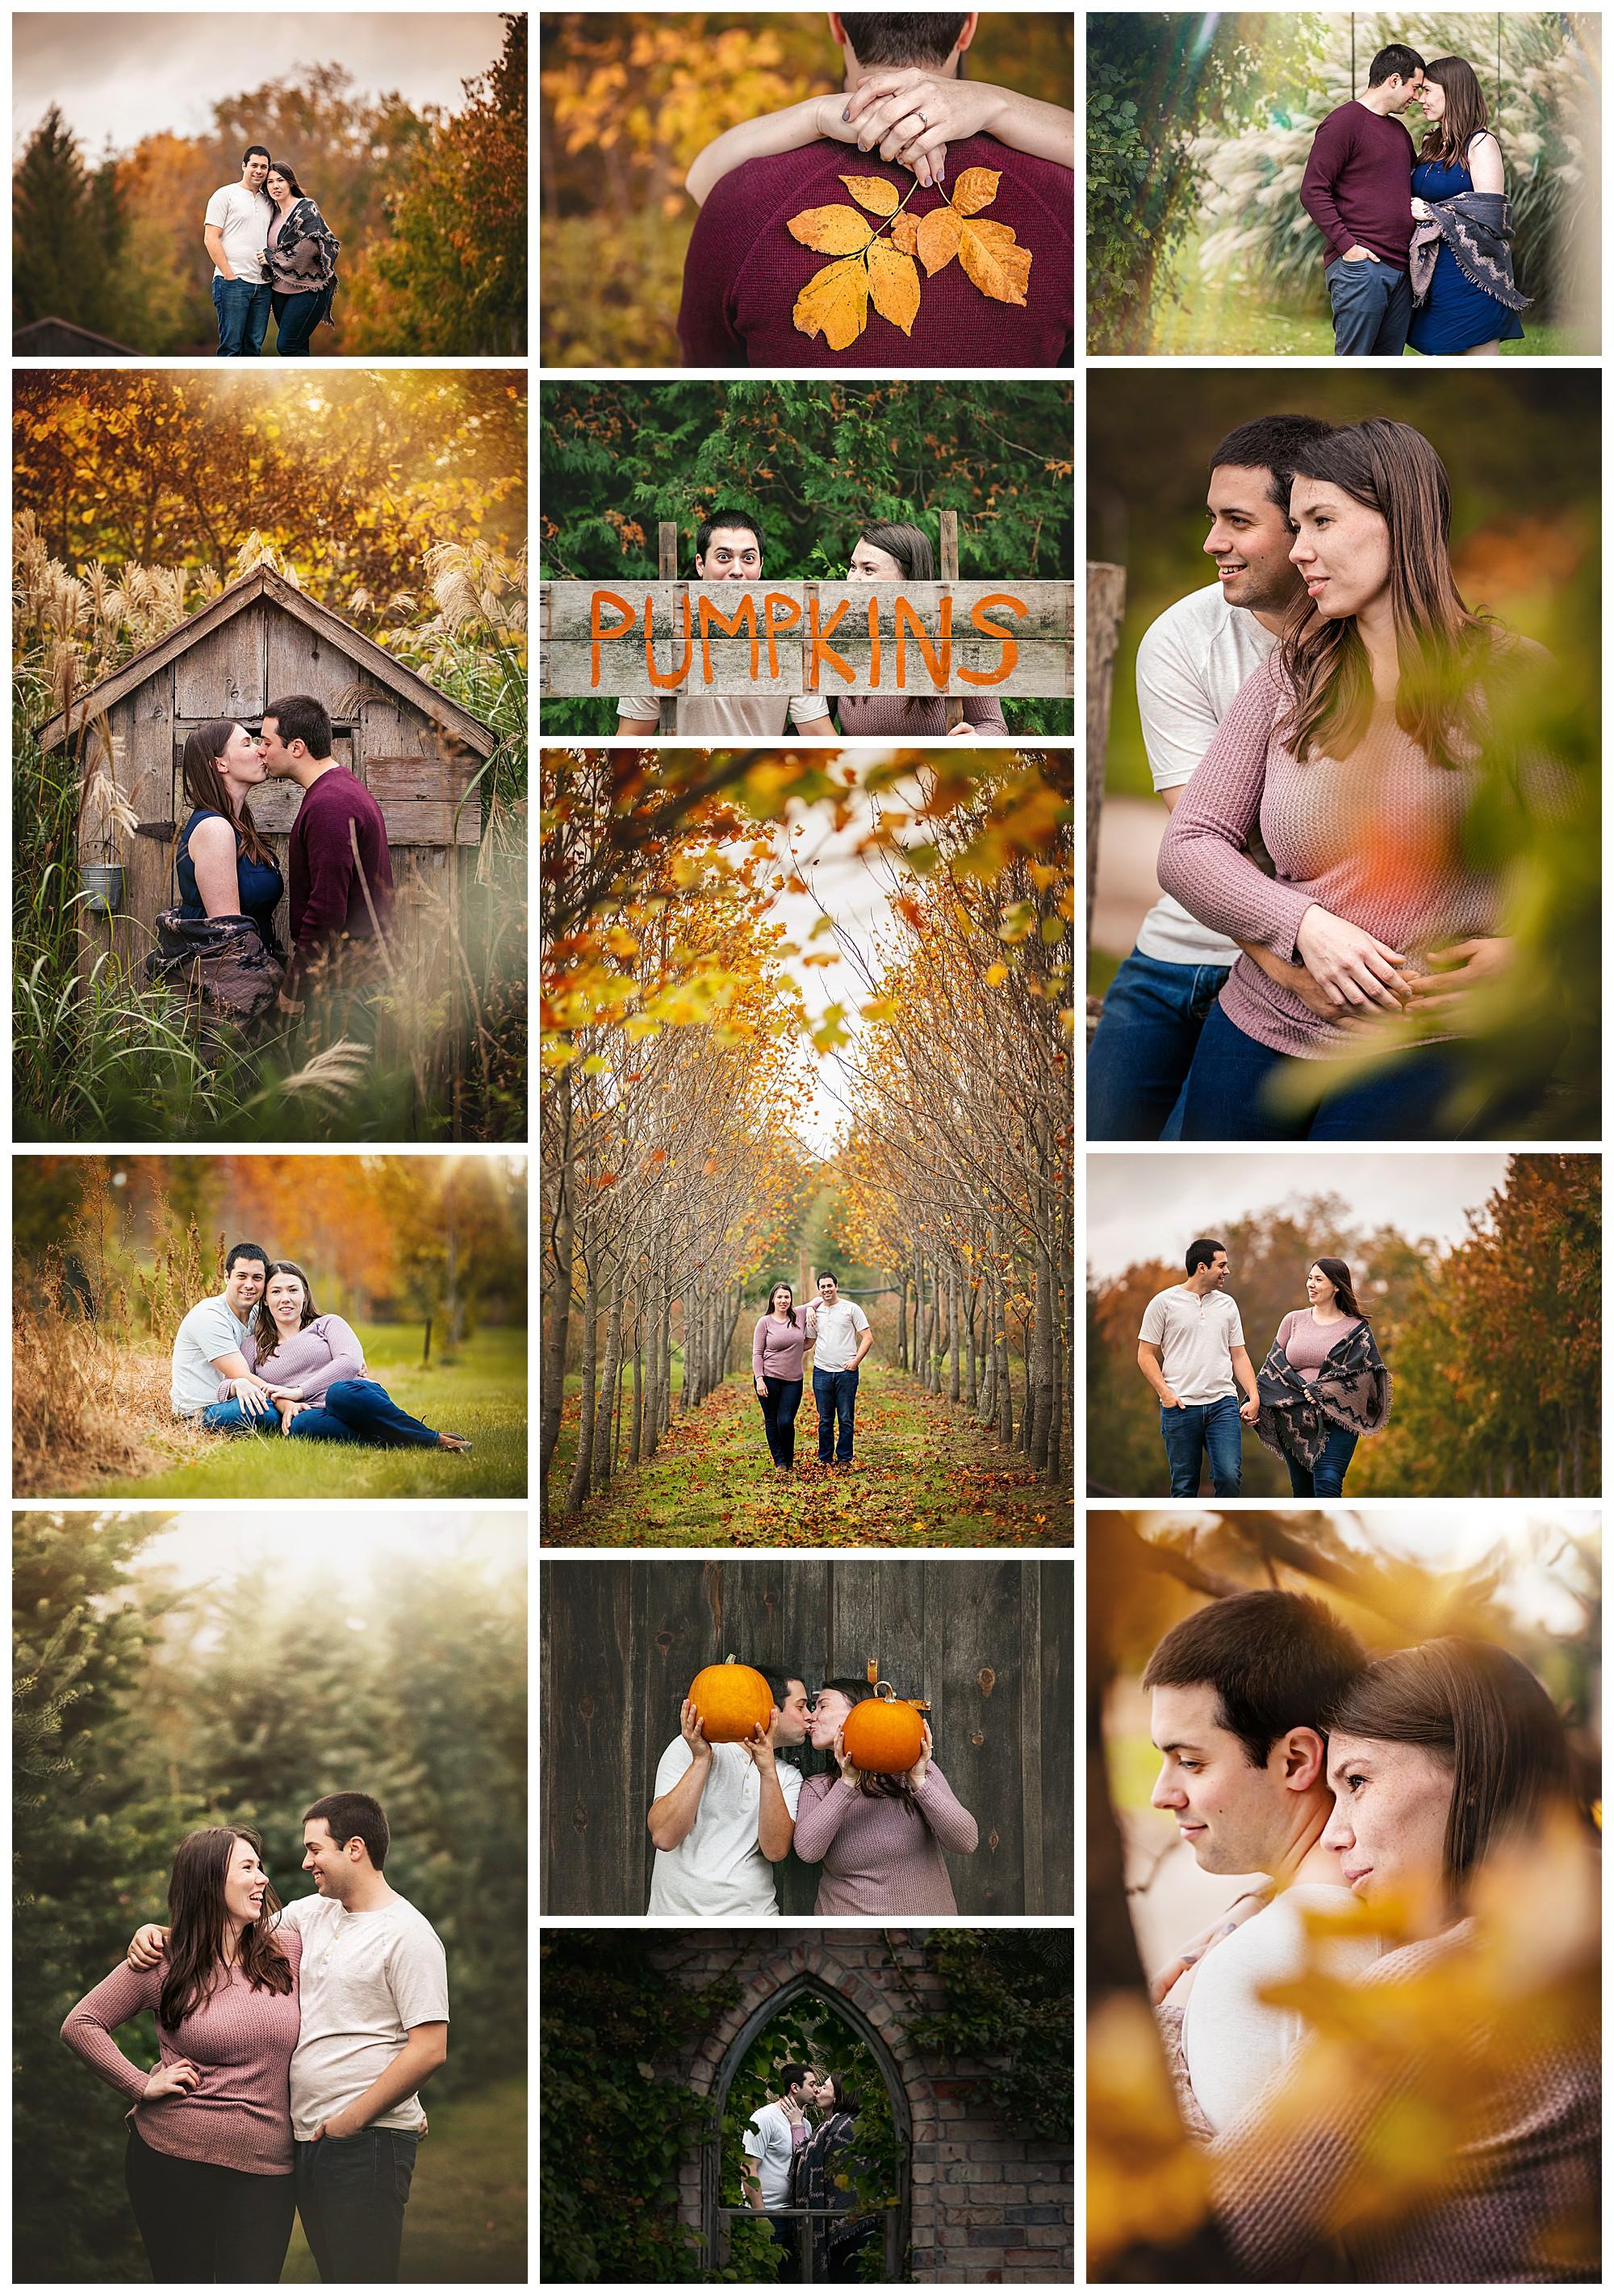 Arrowwood Farm, Melbourne, Ontario engagement photos by VanDaele & Russell